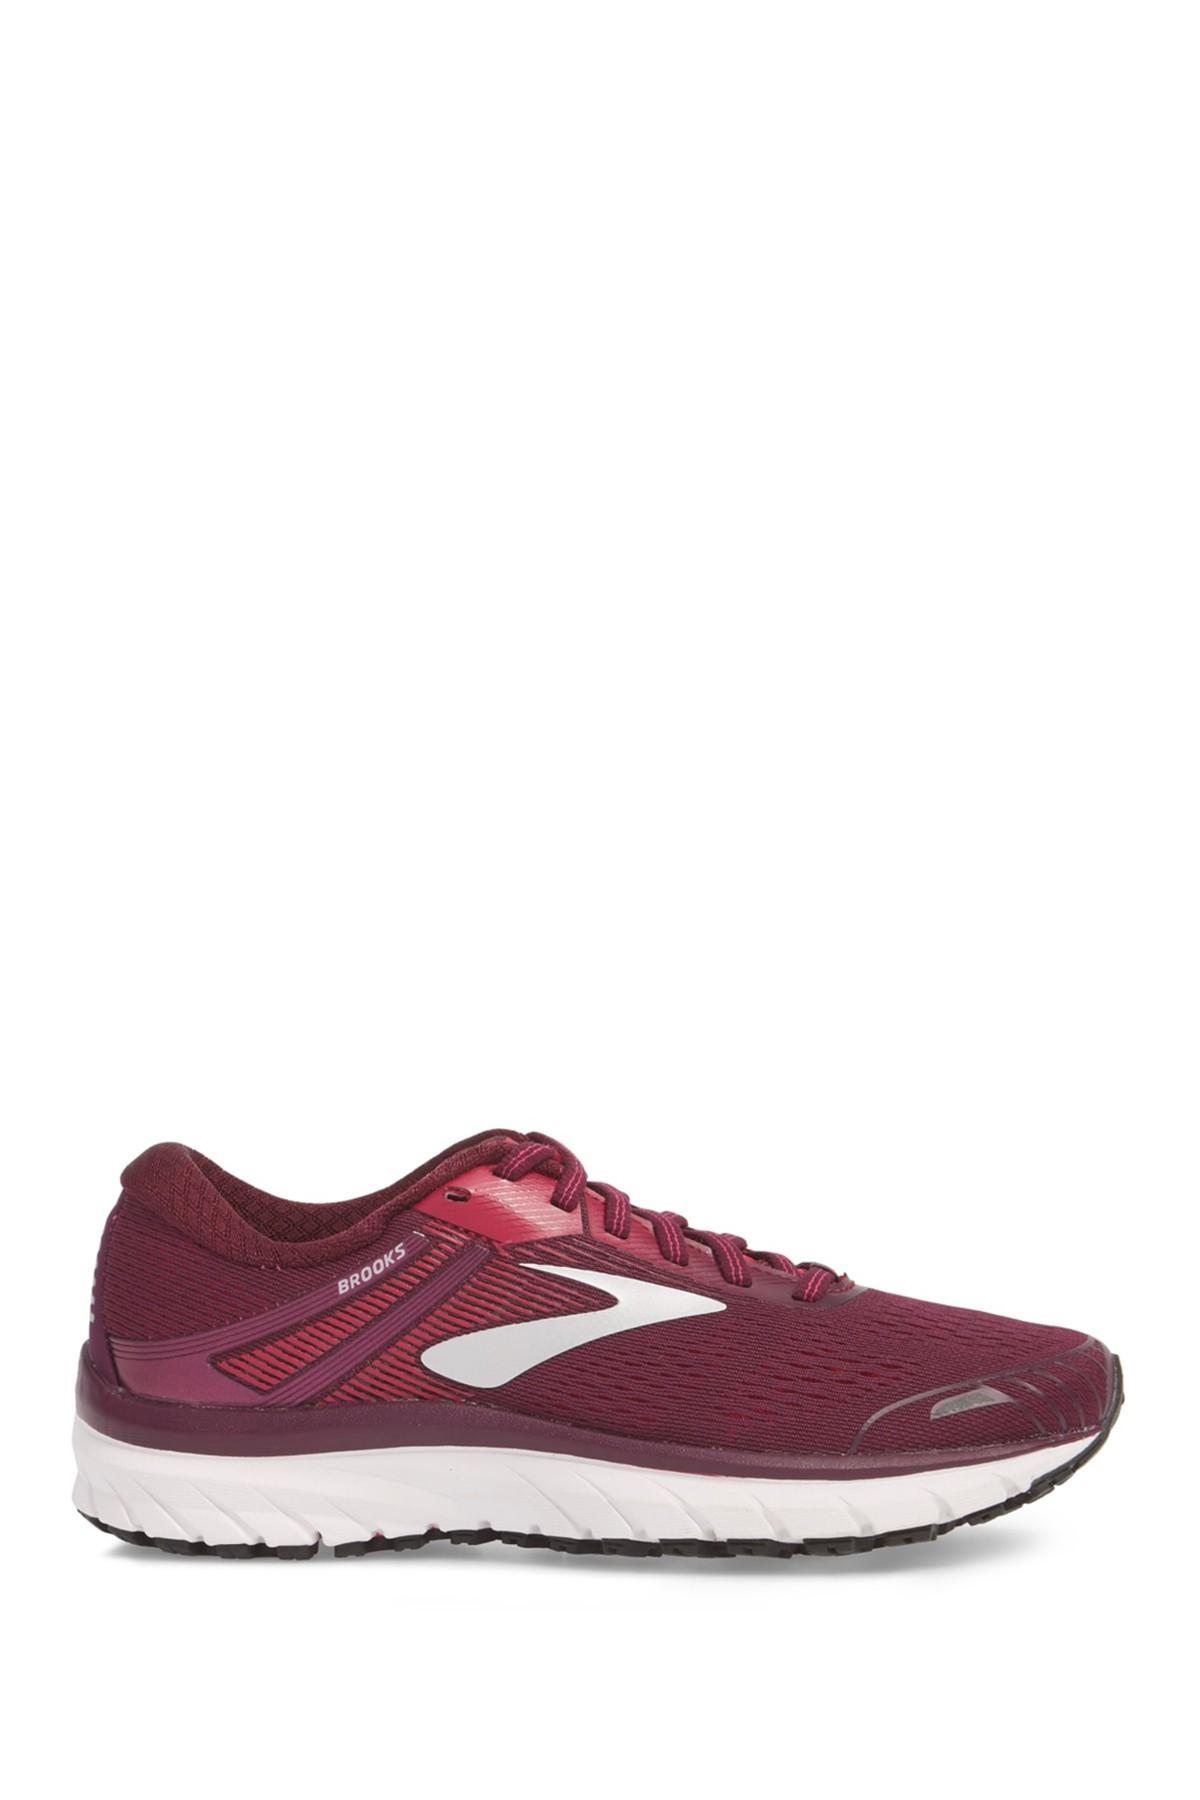 38ec53400ae Brooks - Purple Adrenaline Gts 18 Running Shoe - Lyst. View fullscreen